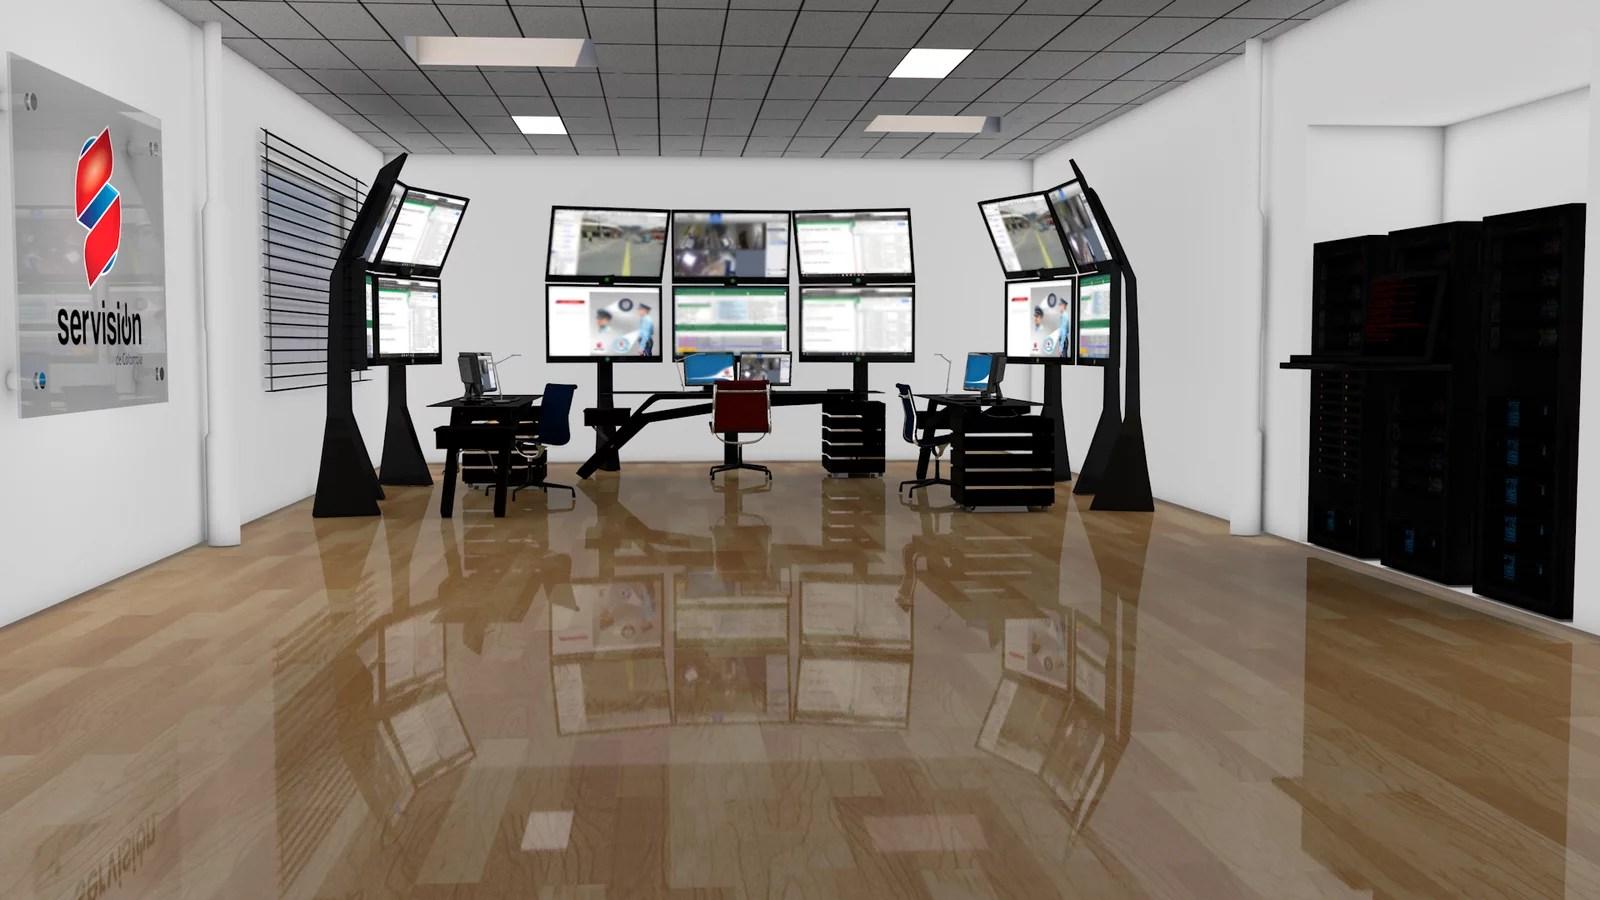 CentrodeMonitoreo1 - Centro de Monitoreo